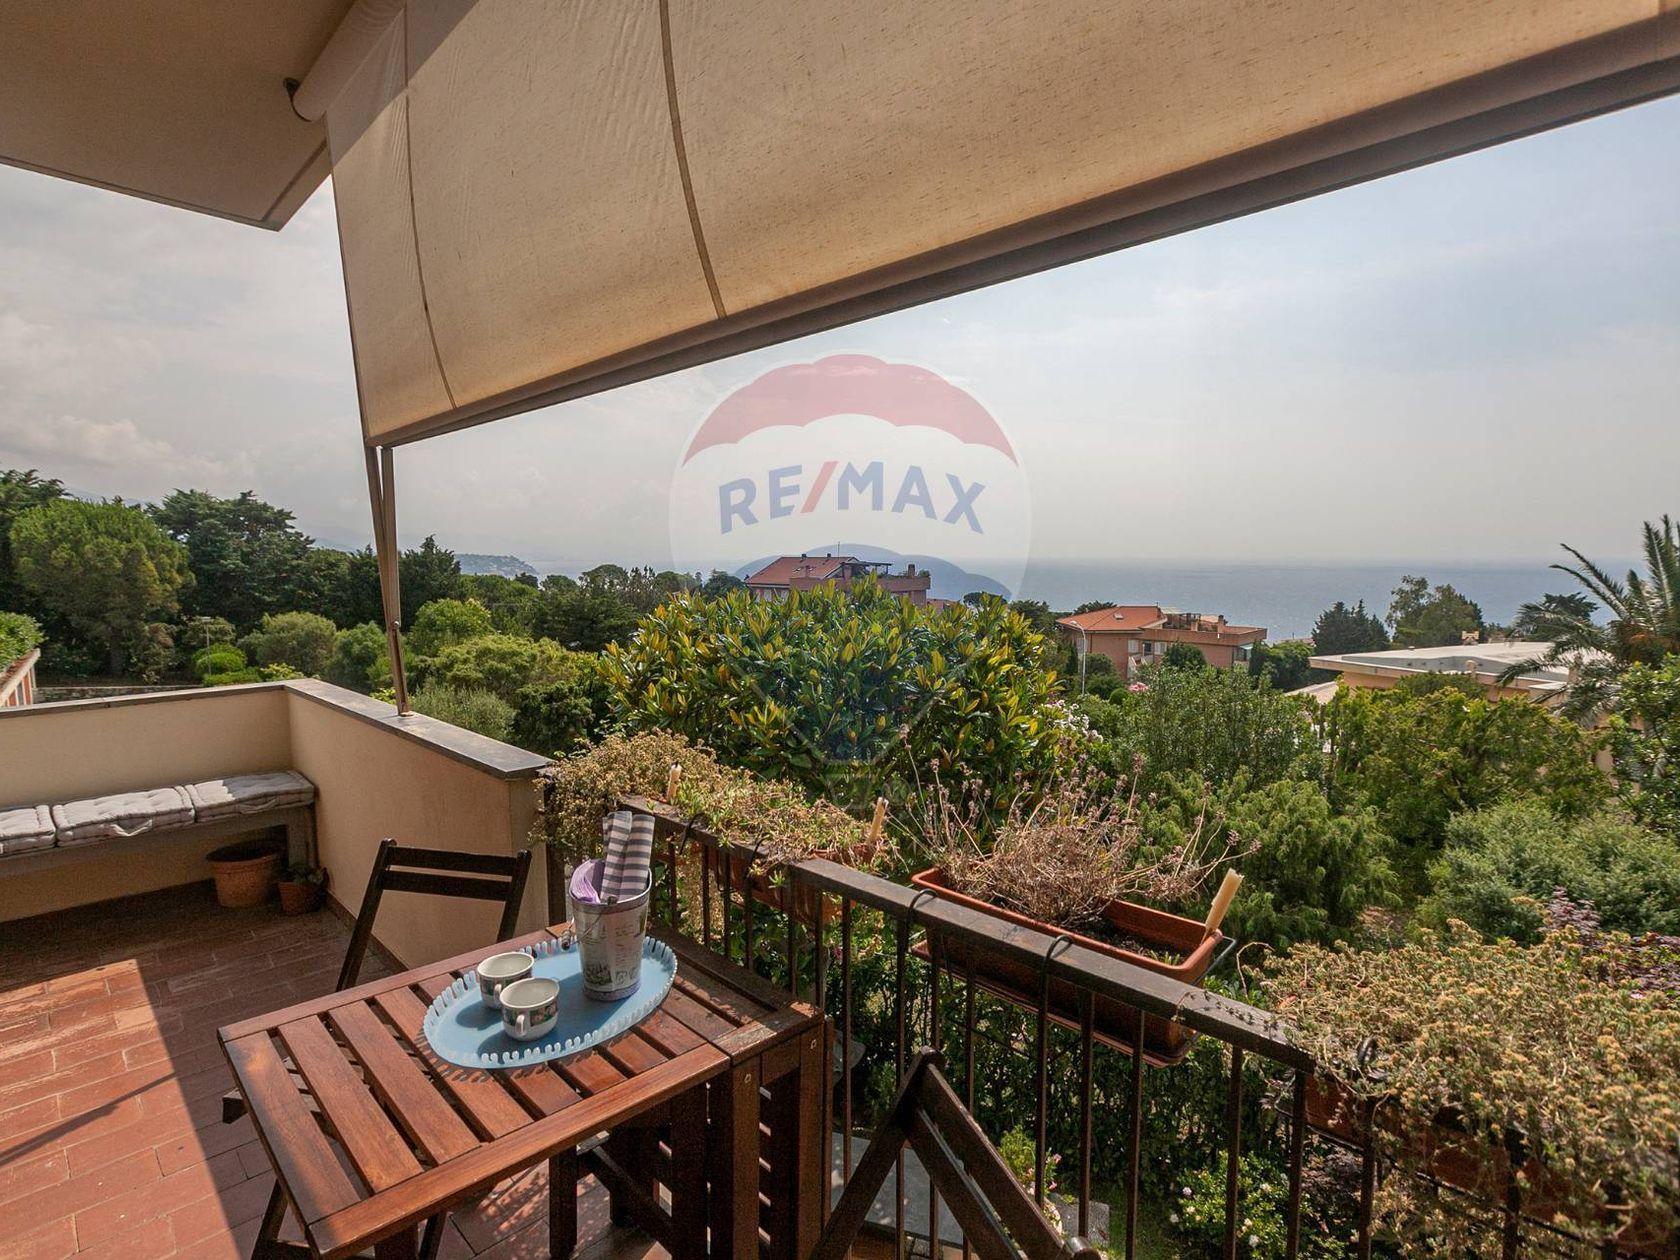 Agenzie Immobiliari Varazze appartamento in vendita varazze 30151001-628 | re/max italia